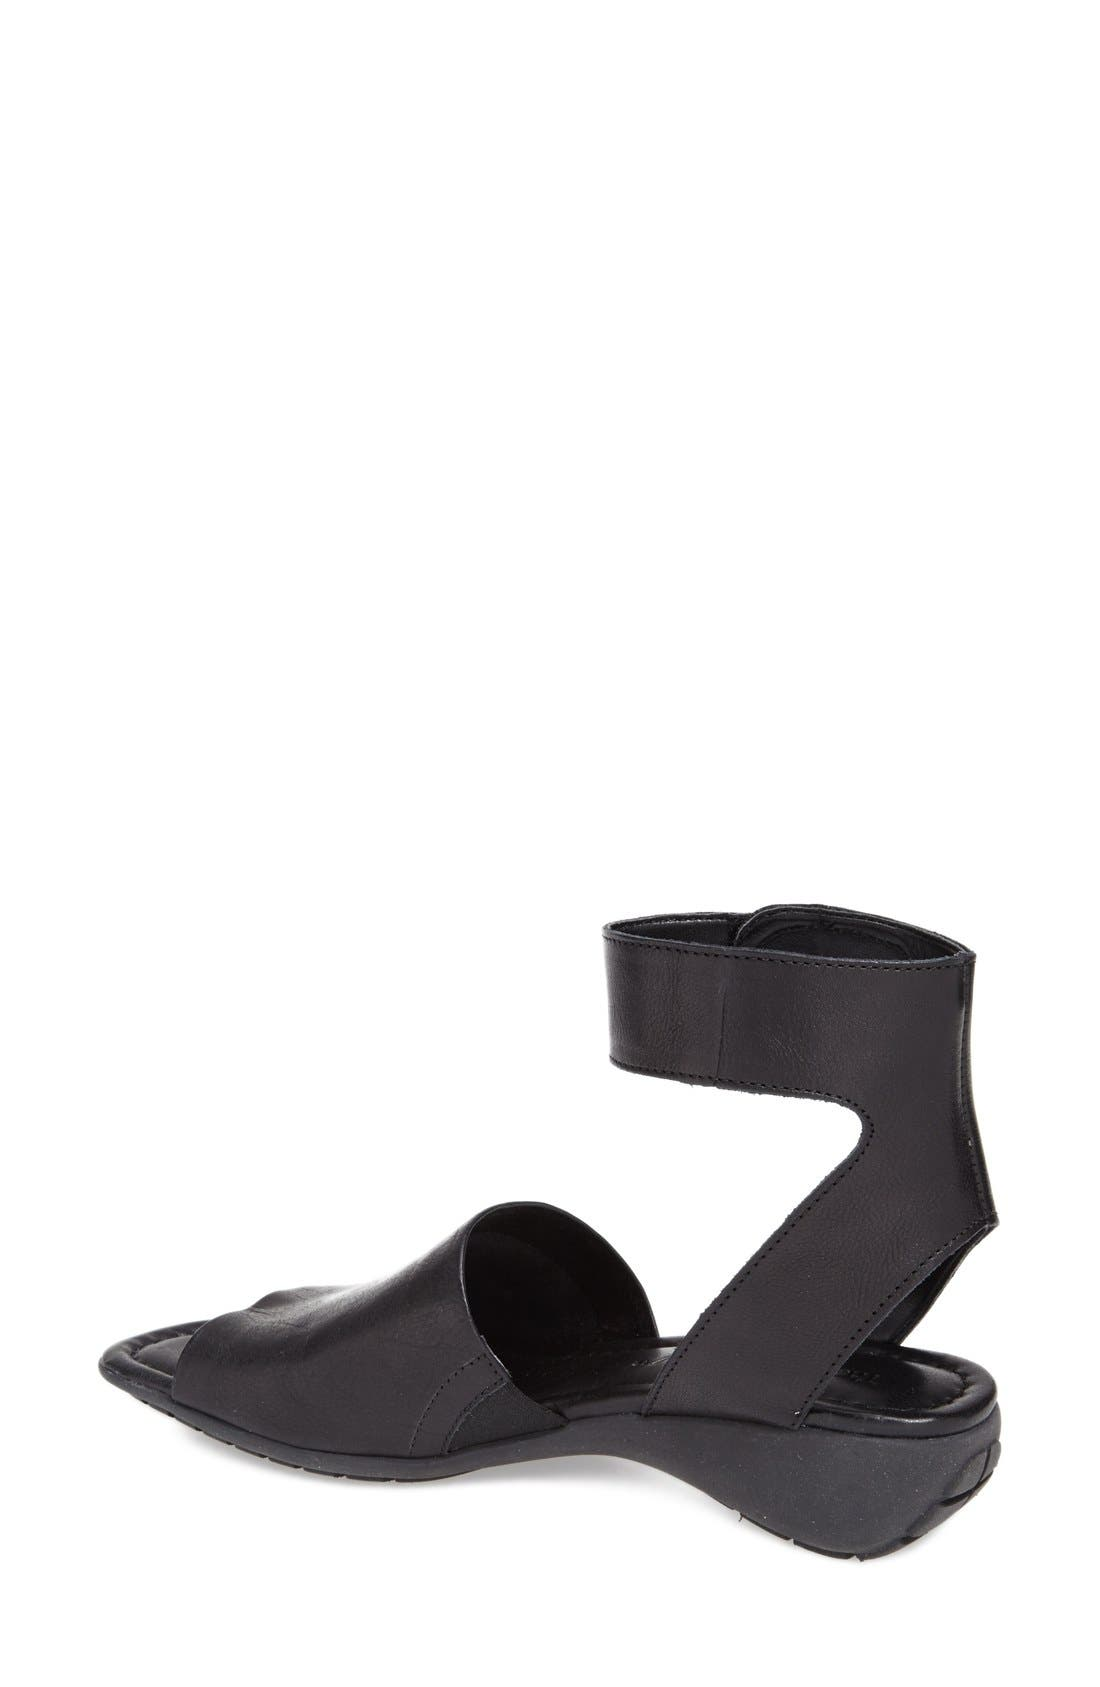 'Beglad' Leather Ankle Strap Sandal,                             Alternate thumbnail 22, color,